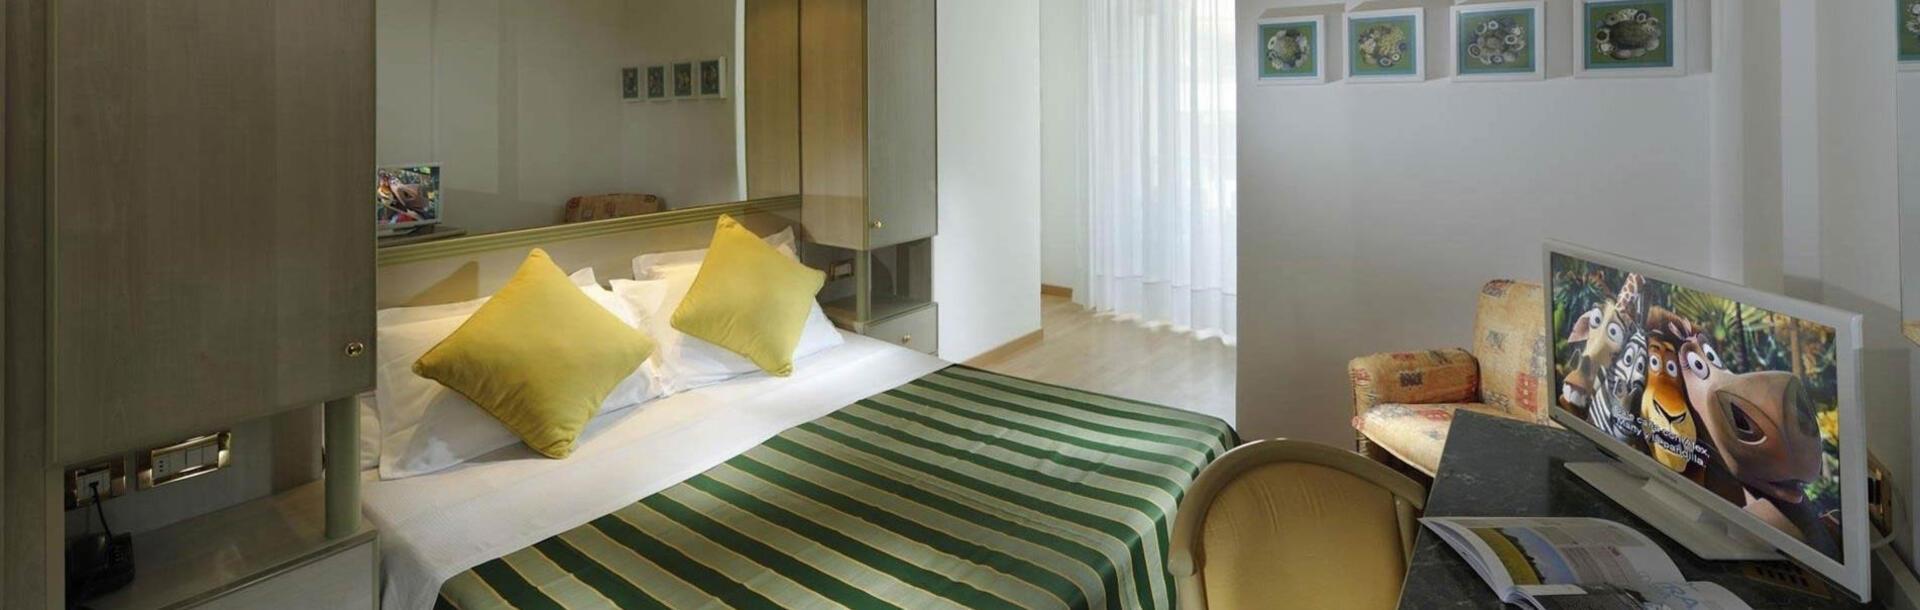 hotel-montecarlo it family-room-bibione 013